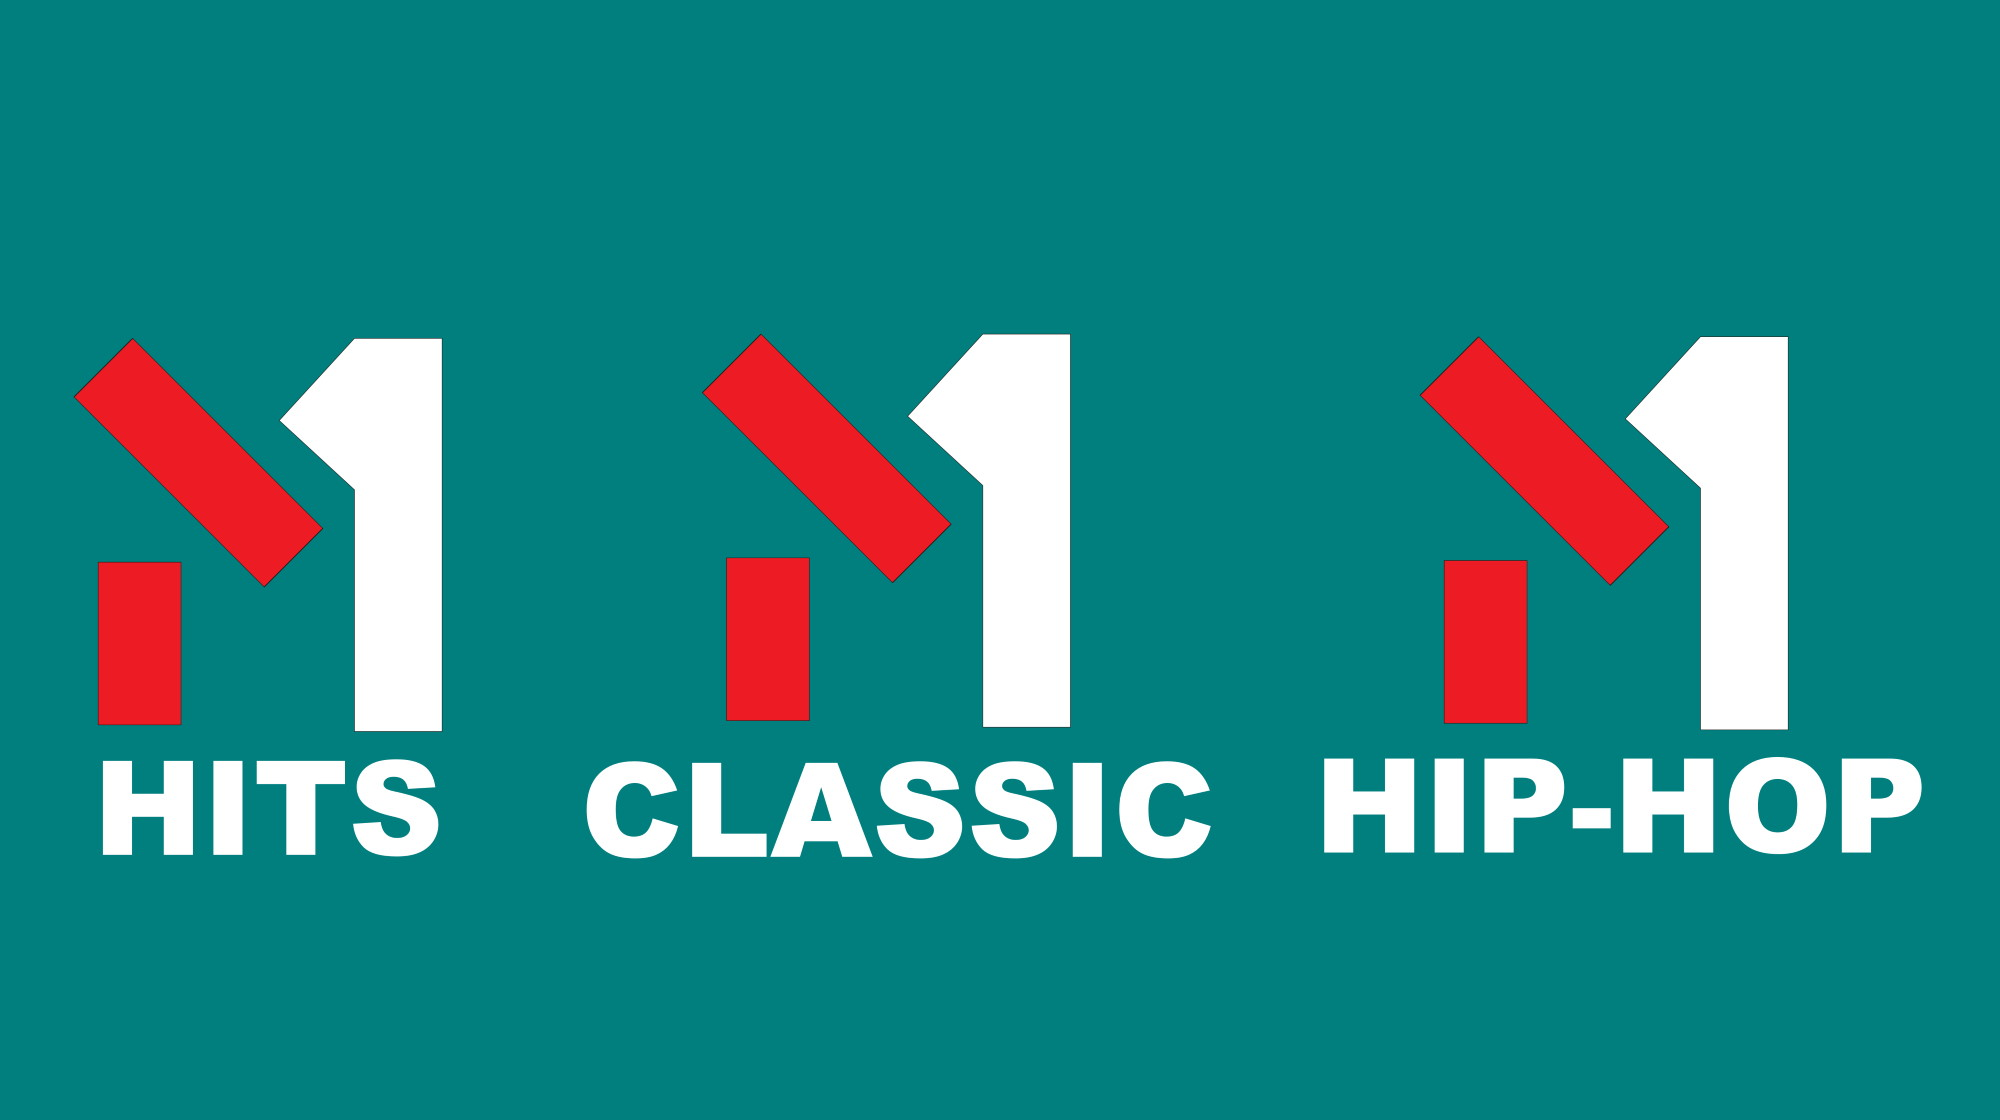 M1 CLASSIC, M1 HITS, M1 HIP-HOP